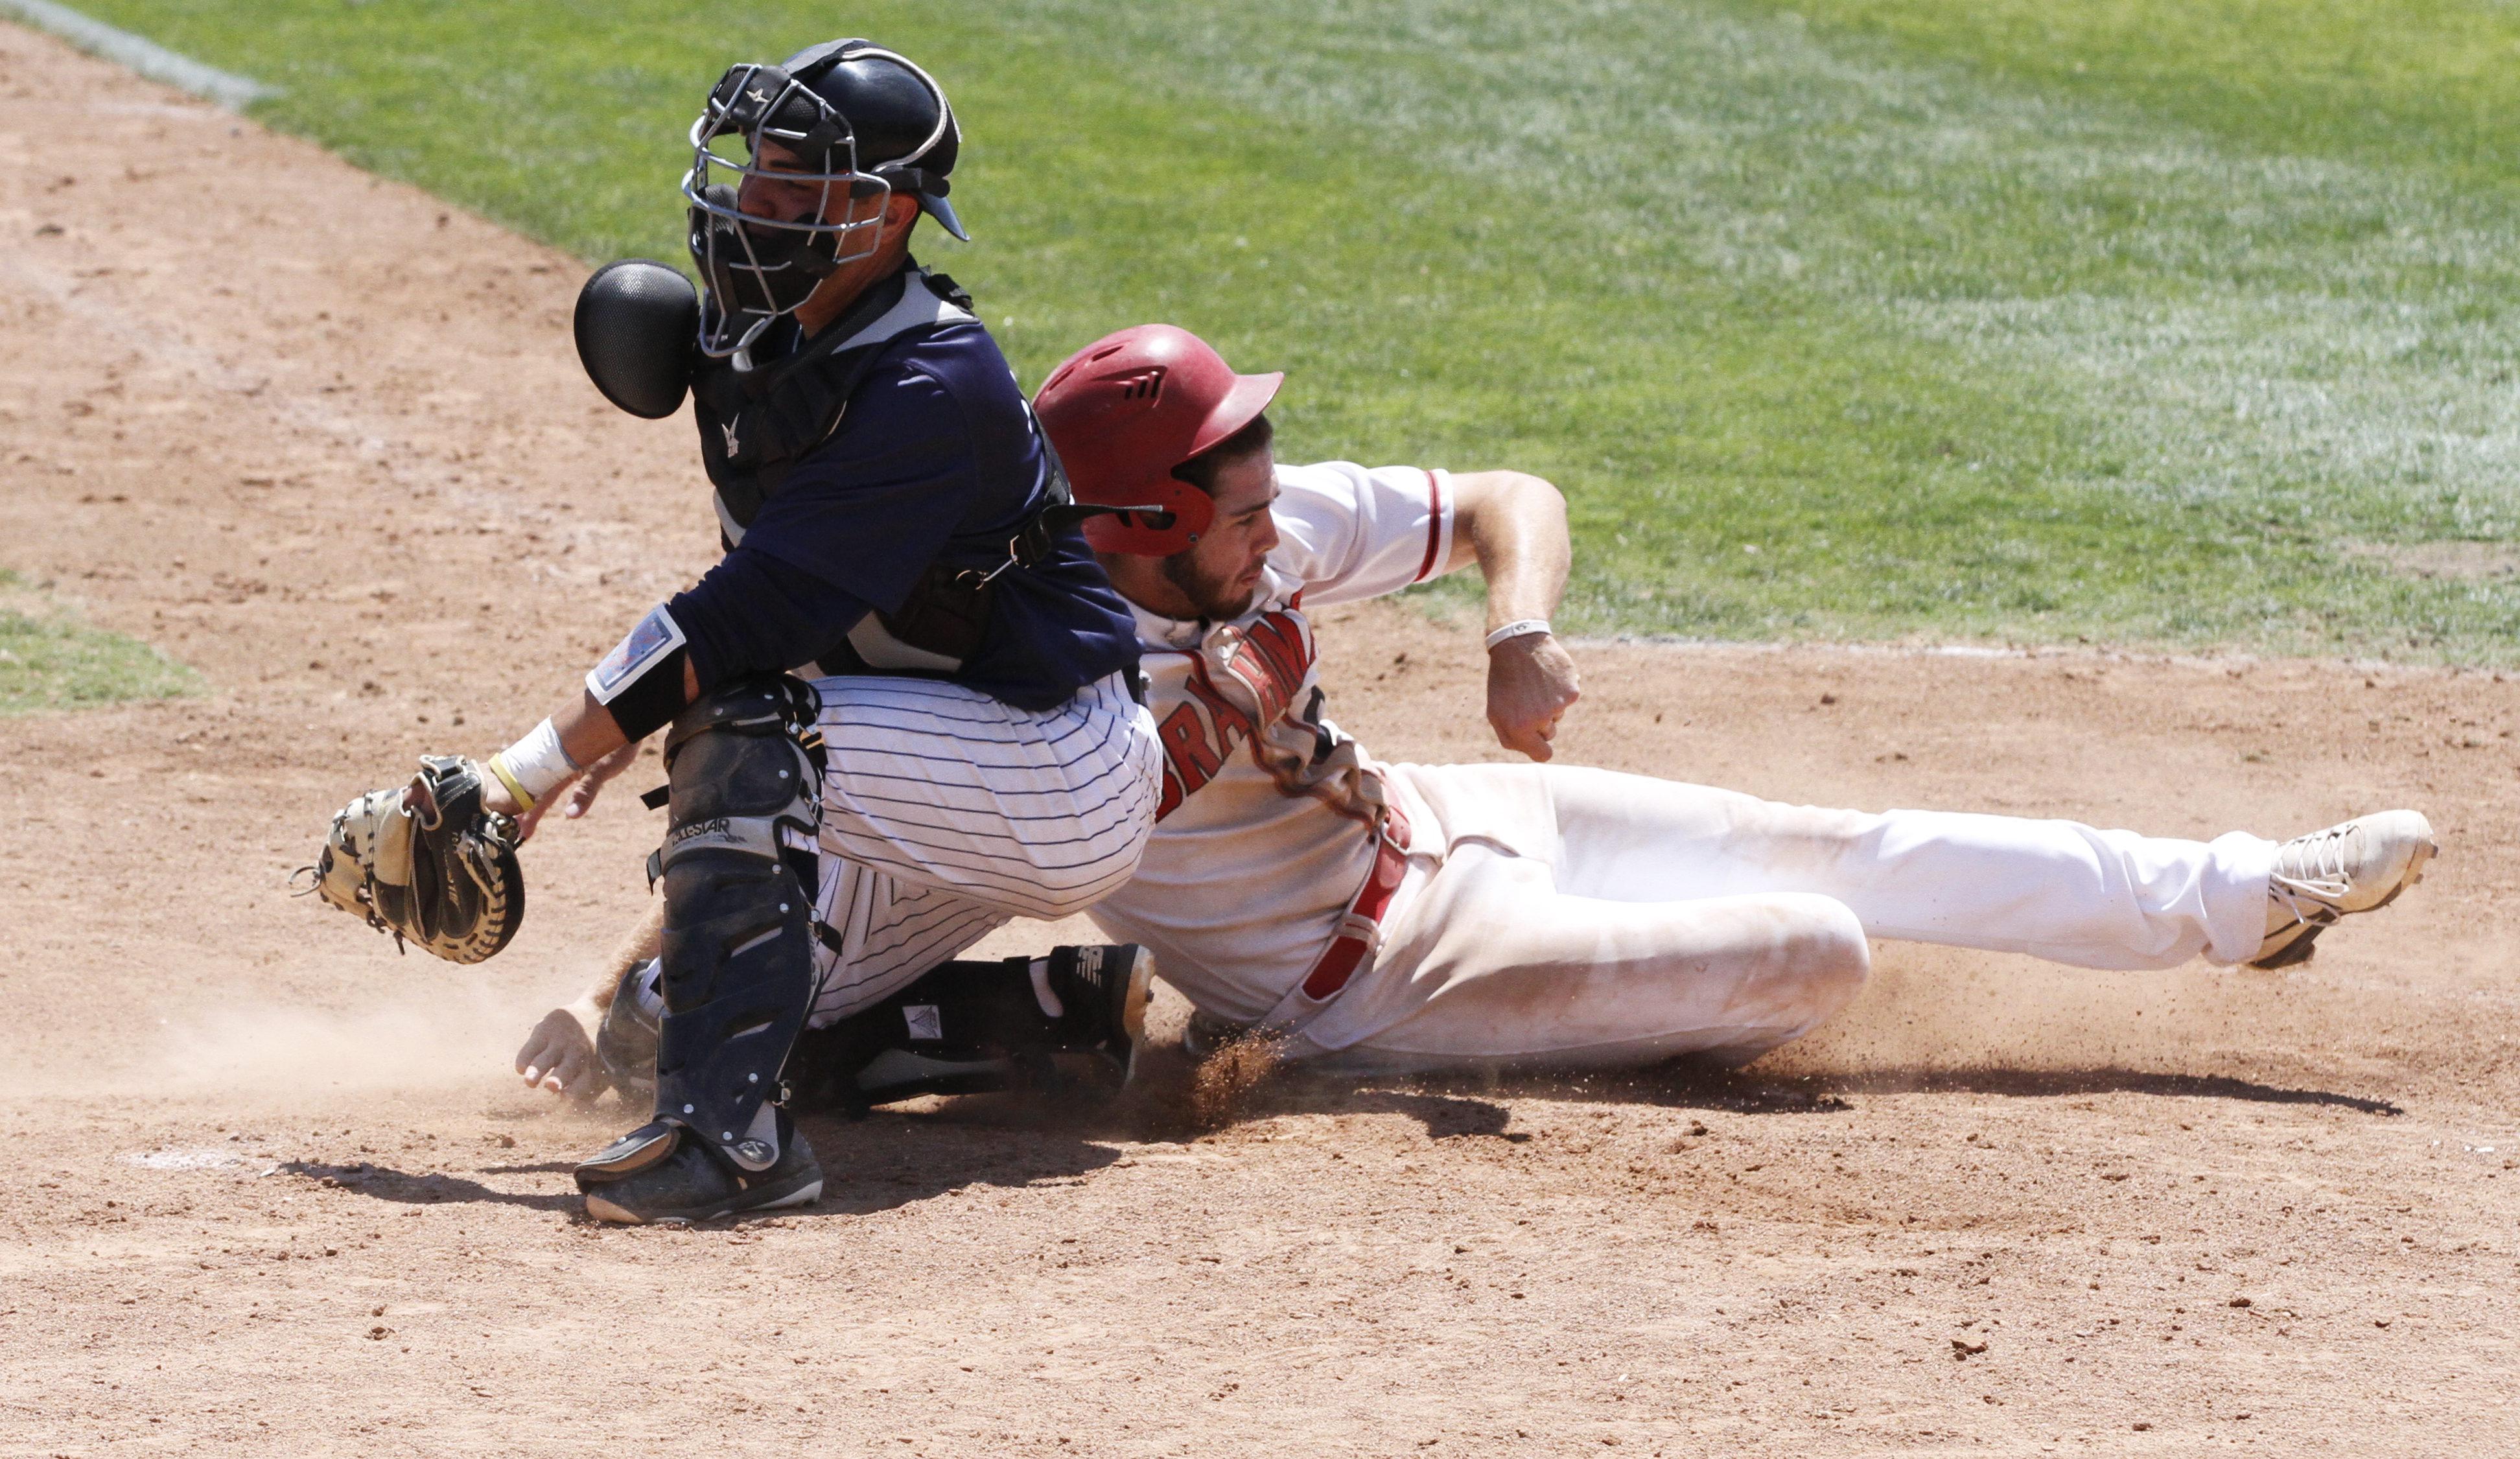 Baseball improve on last year's finish